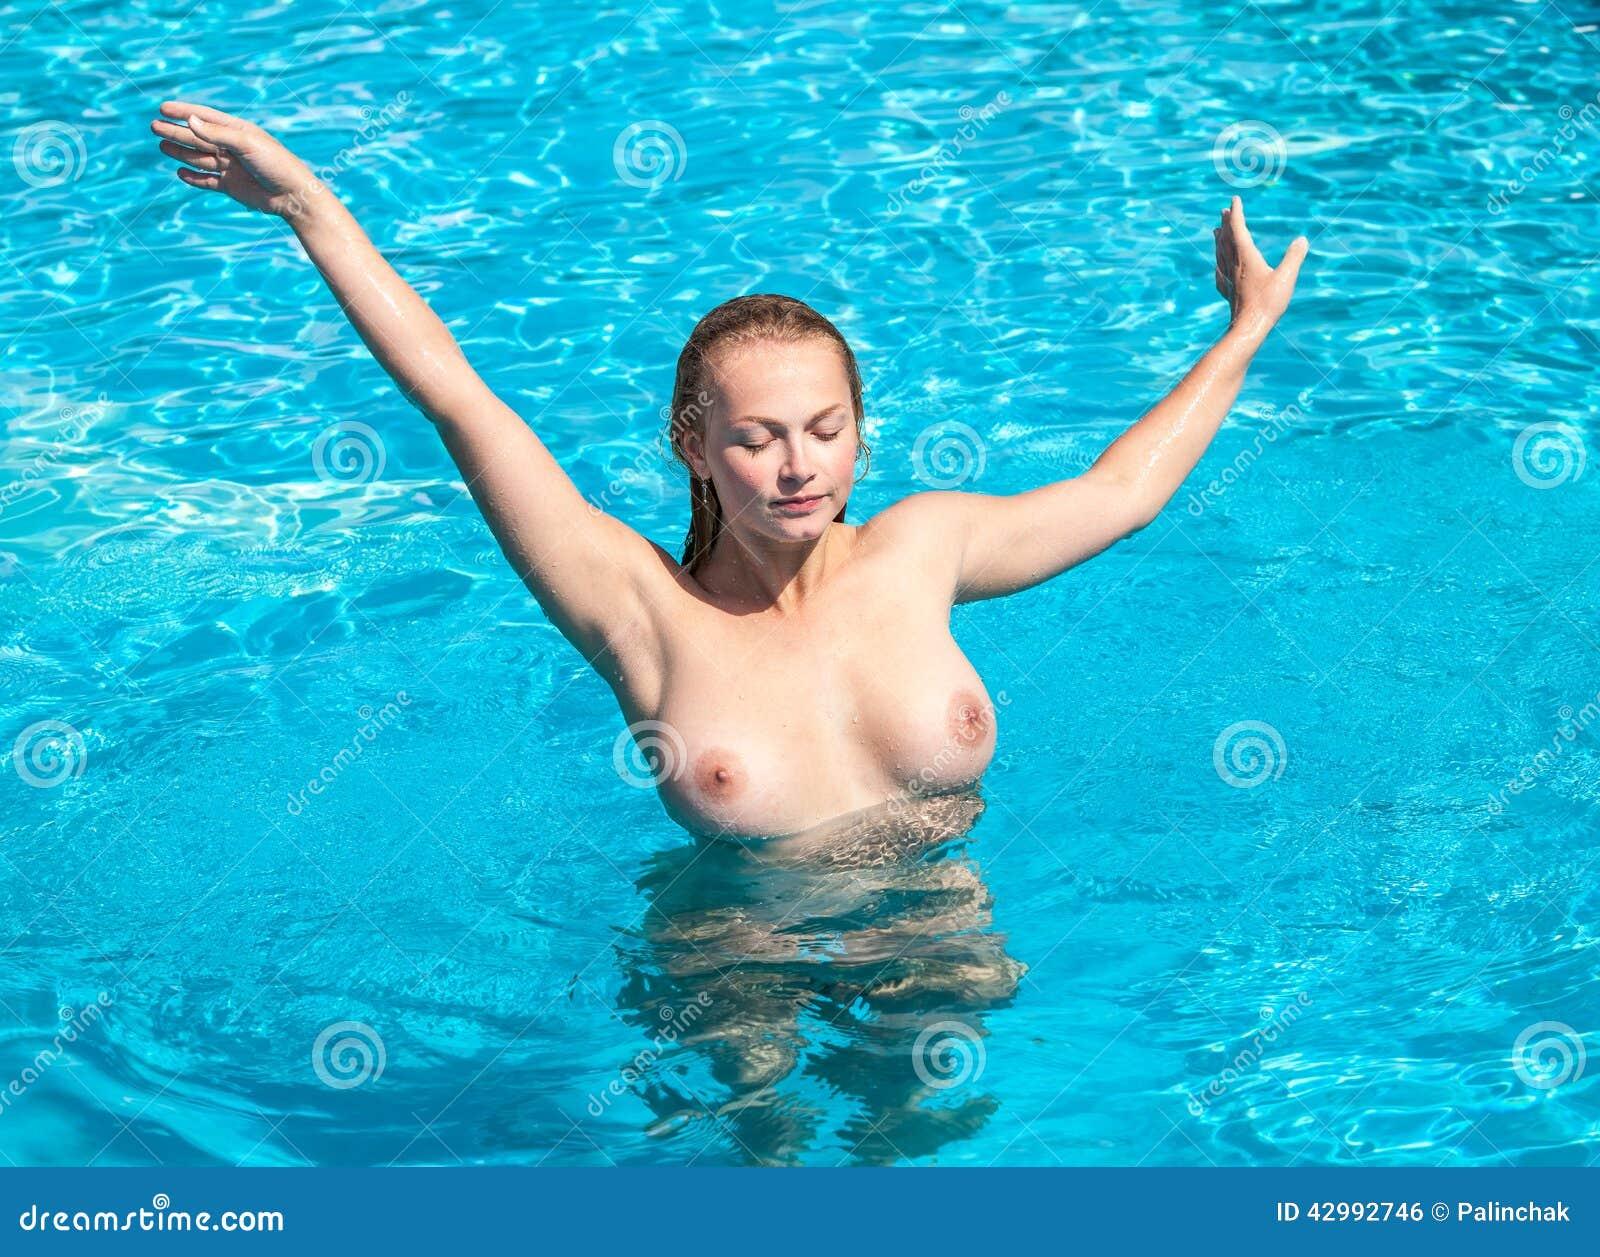 nude women in pools